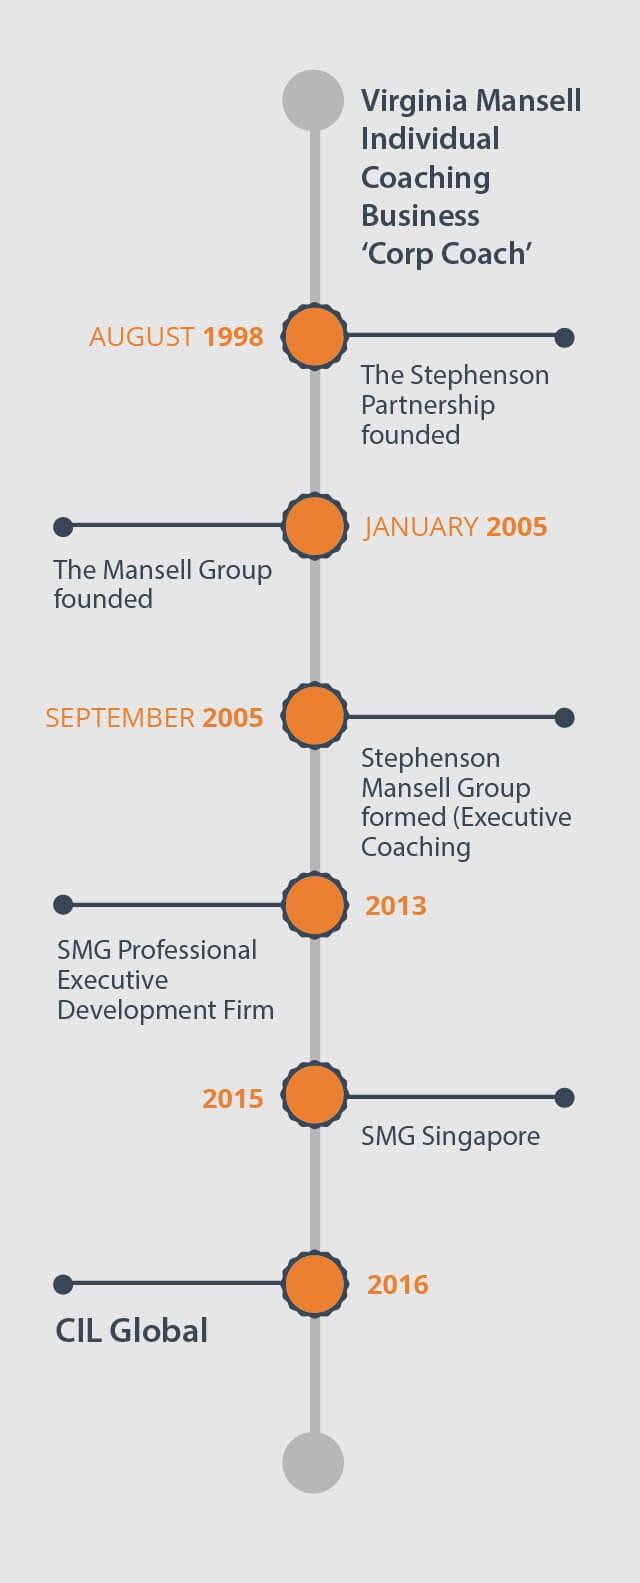 Virginia Mansell Individual Coaching Business 'Corp Coach'